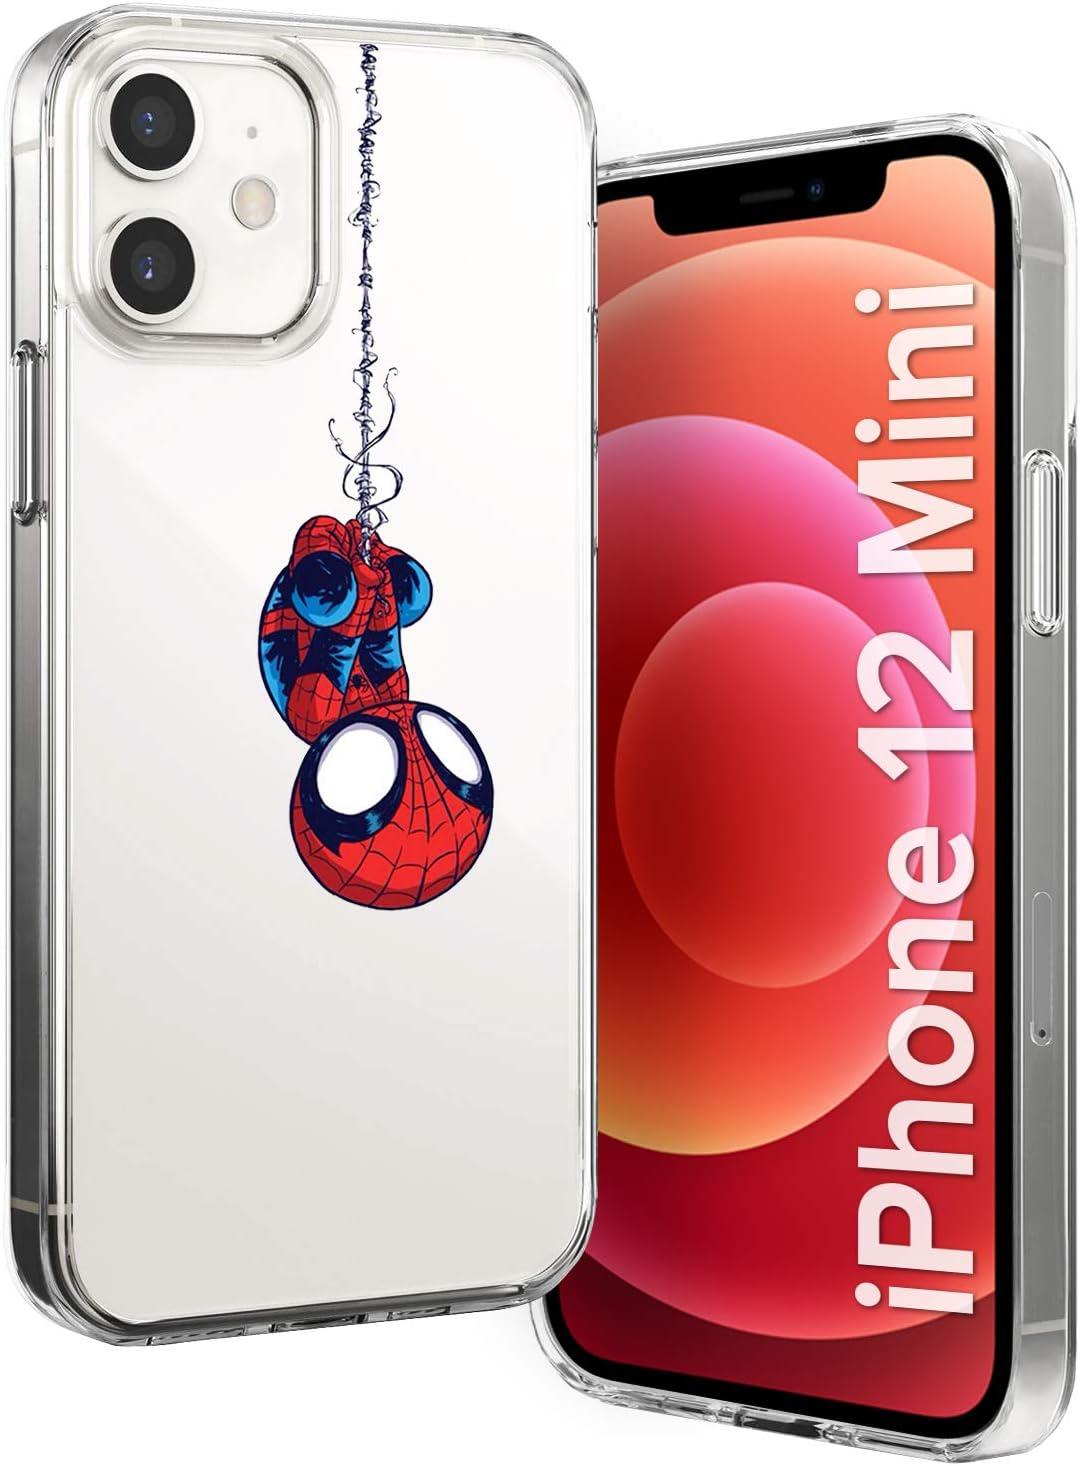 Litech Spider Man Case [Flexfit] Protective Clear Cartoon Comic Super Hero Case for Apple iPhone 12 Mini (2020)